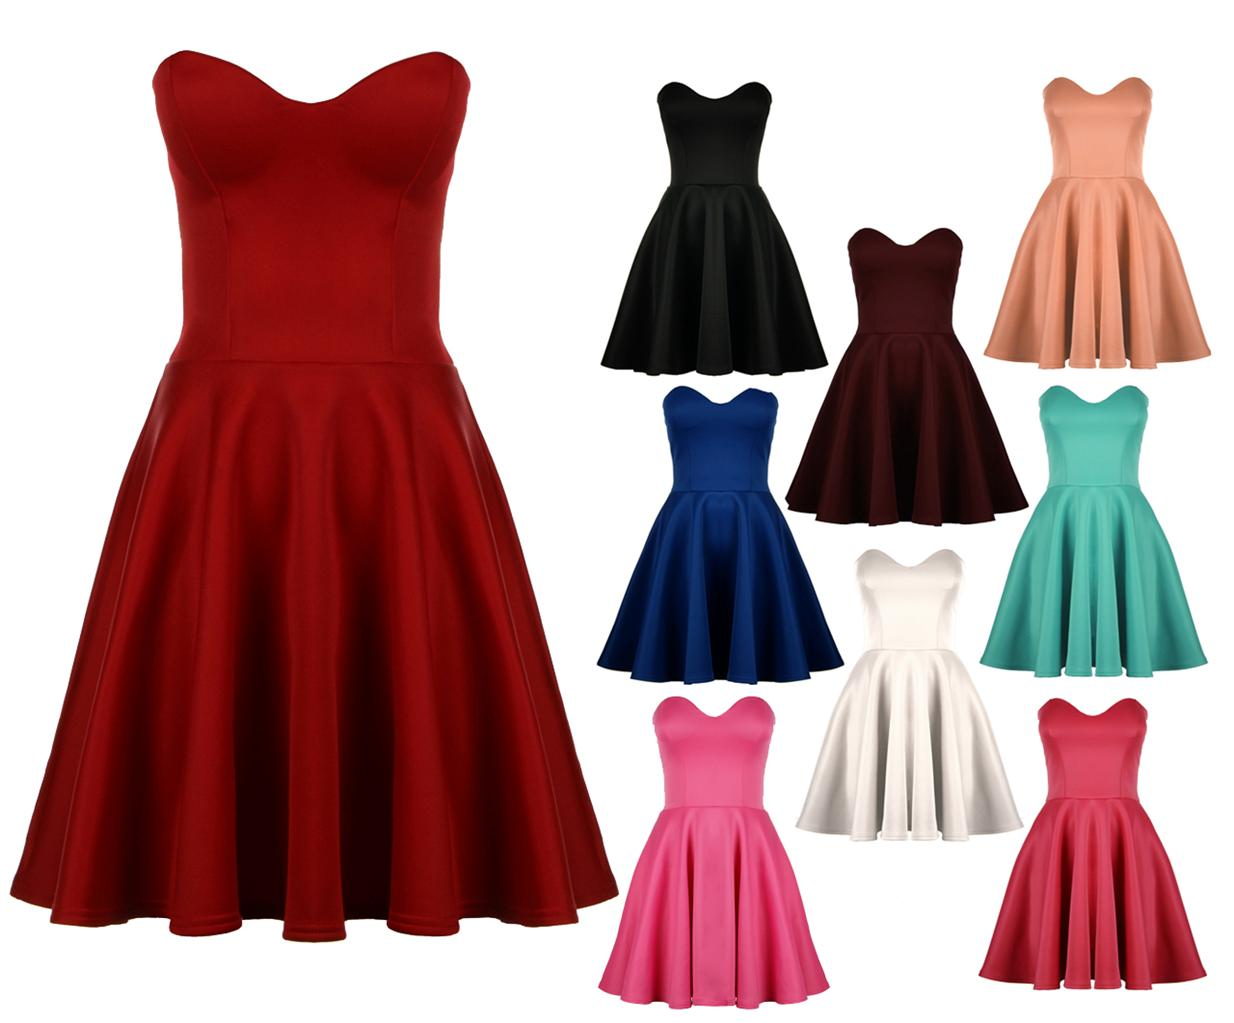 Womens-Ladies-Party-Boobtube-Strapless-Skater-Prom-Dress-UK-8-14